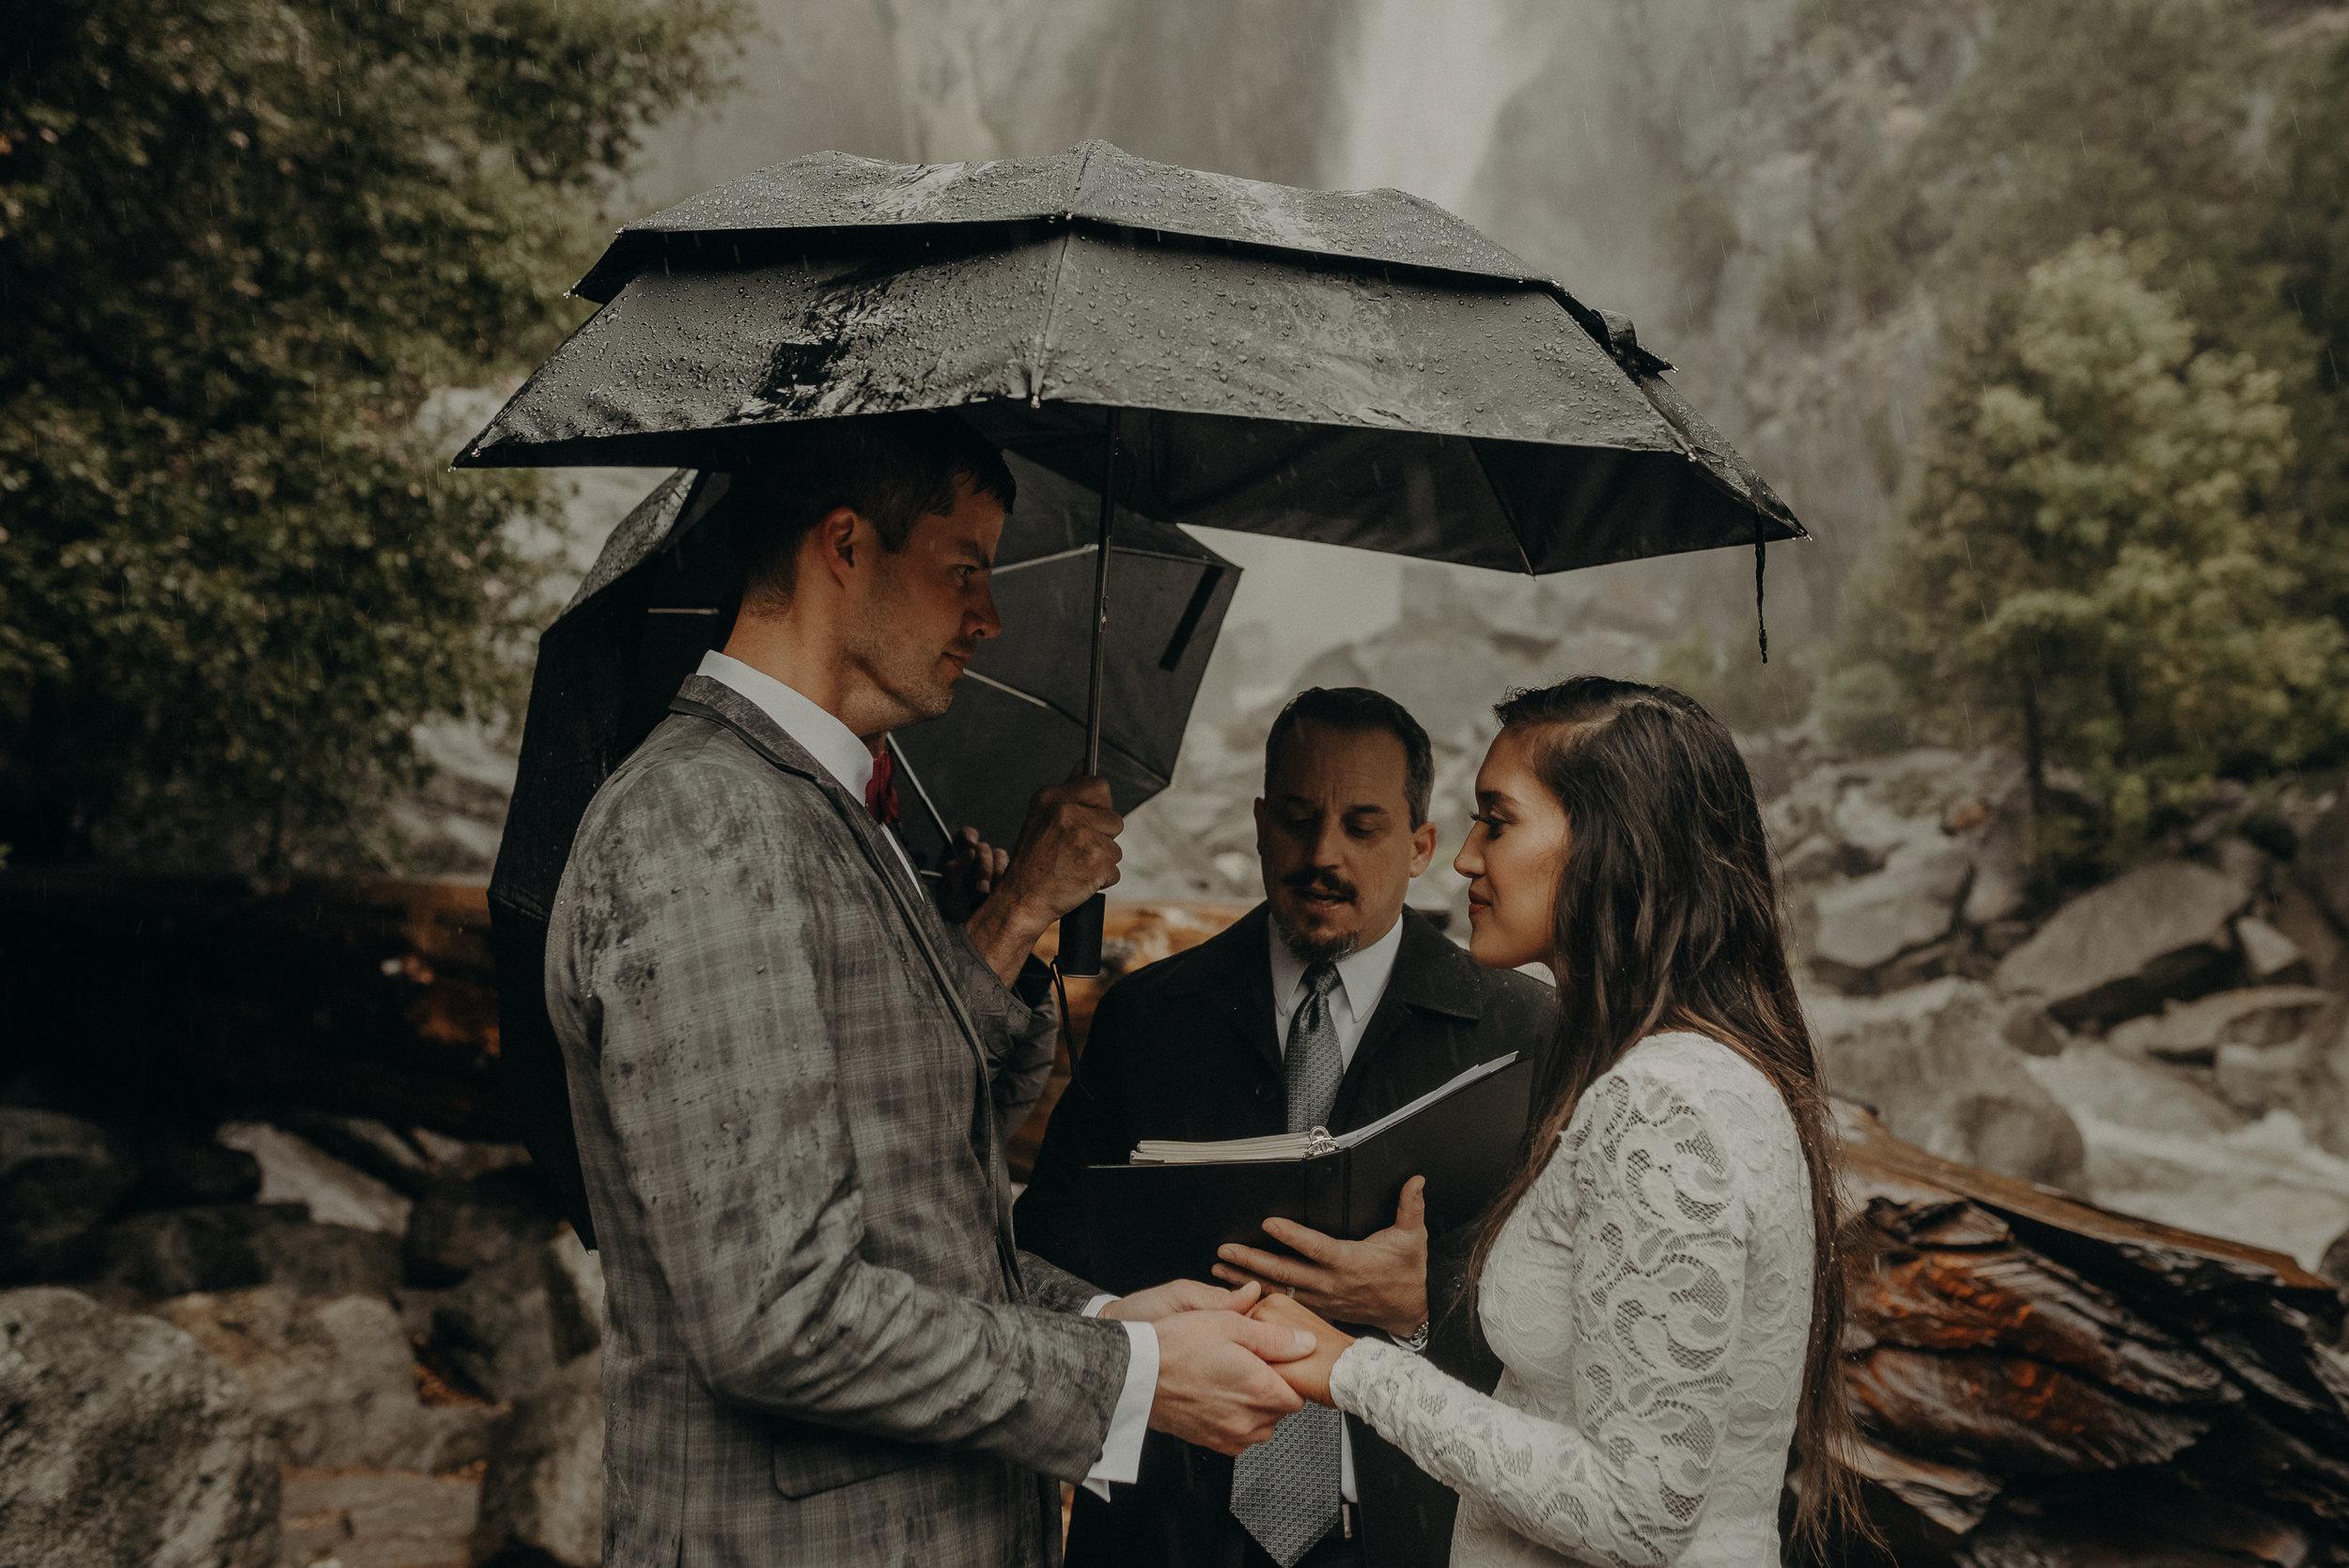 Isaiah + Taylor Photography - Yosemite Elopement - Los Angeles Wedding Photographer-35.jpg